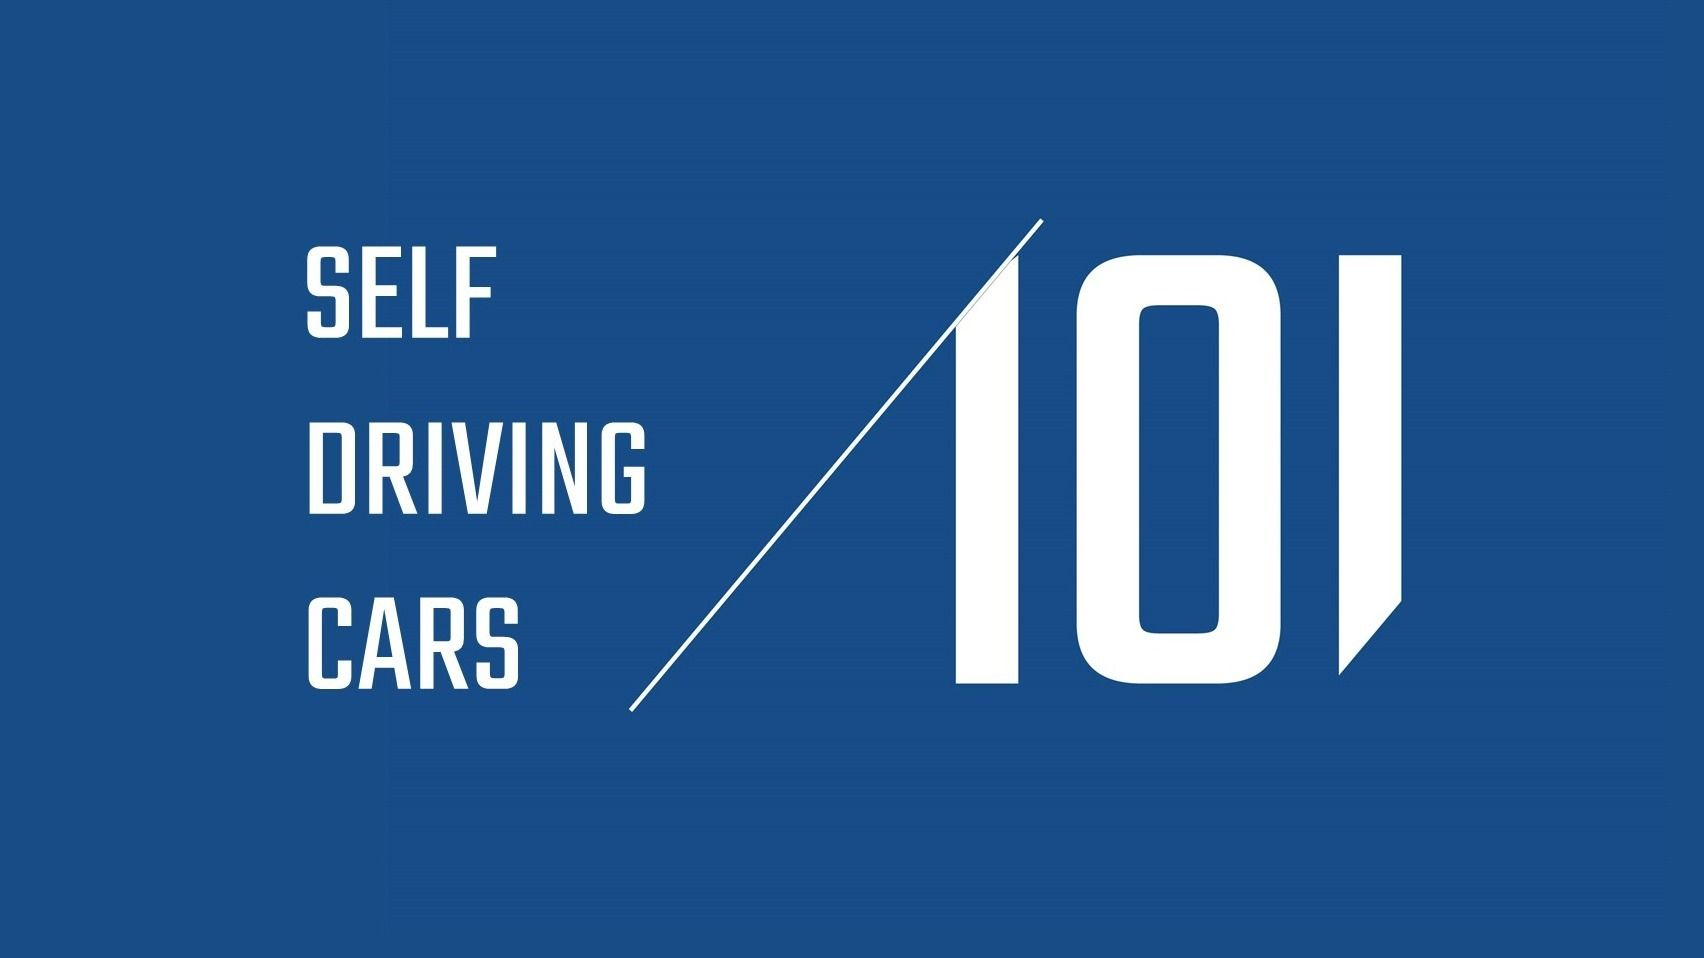 TLV Self Driving Cars 101